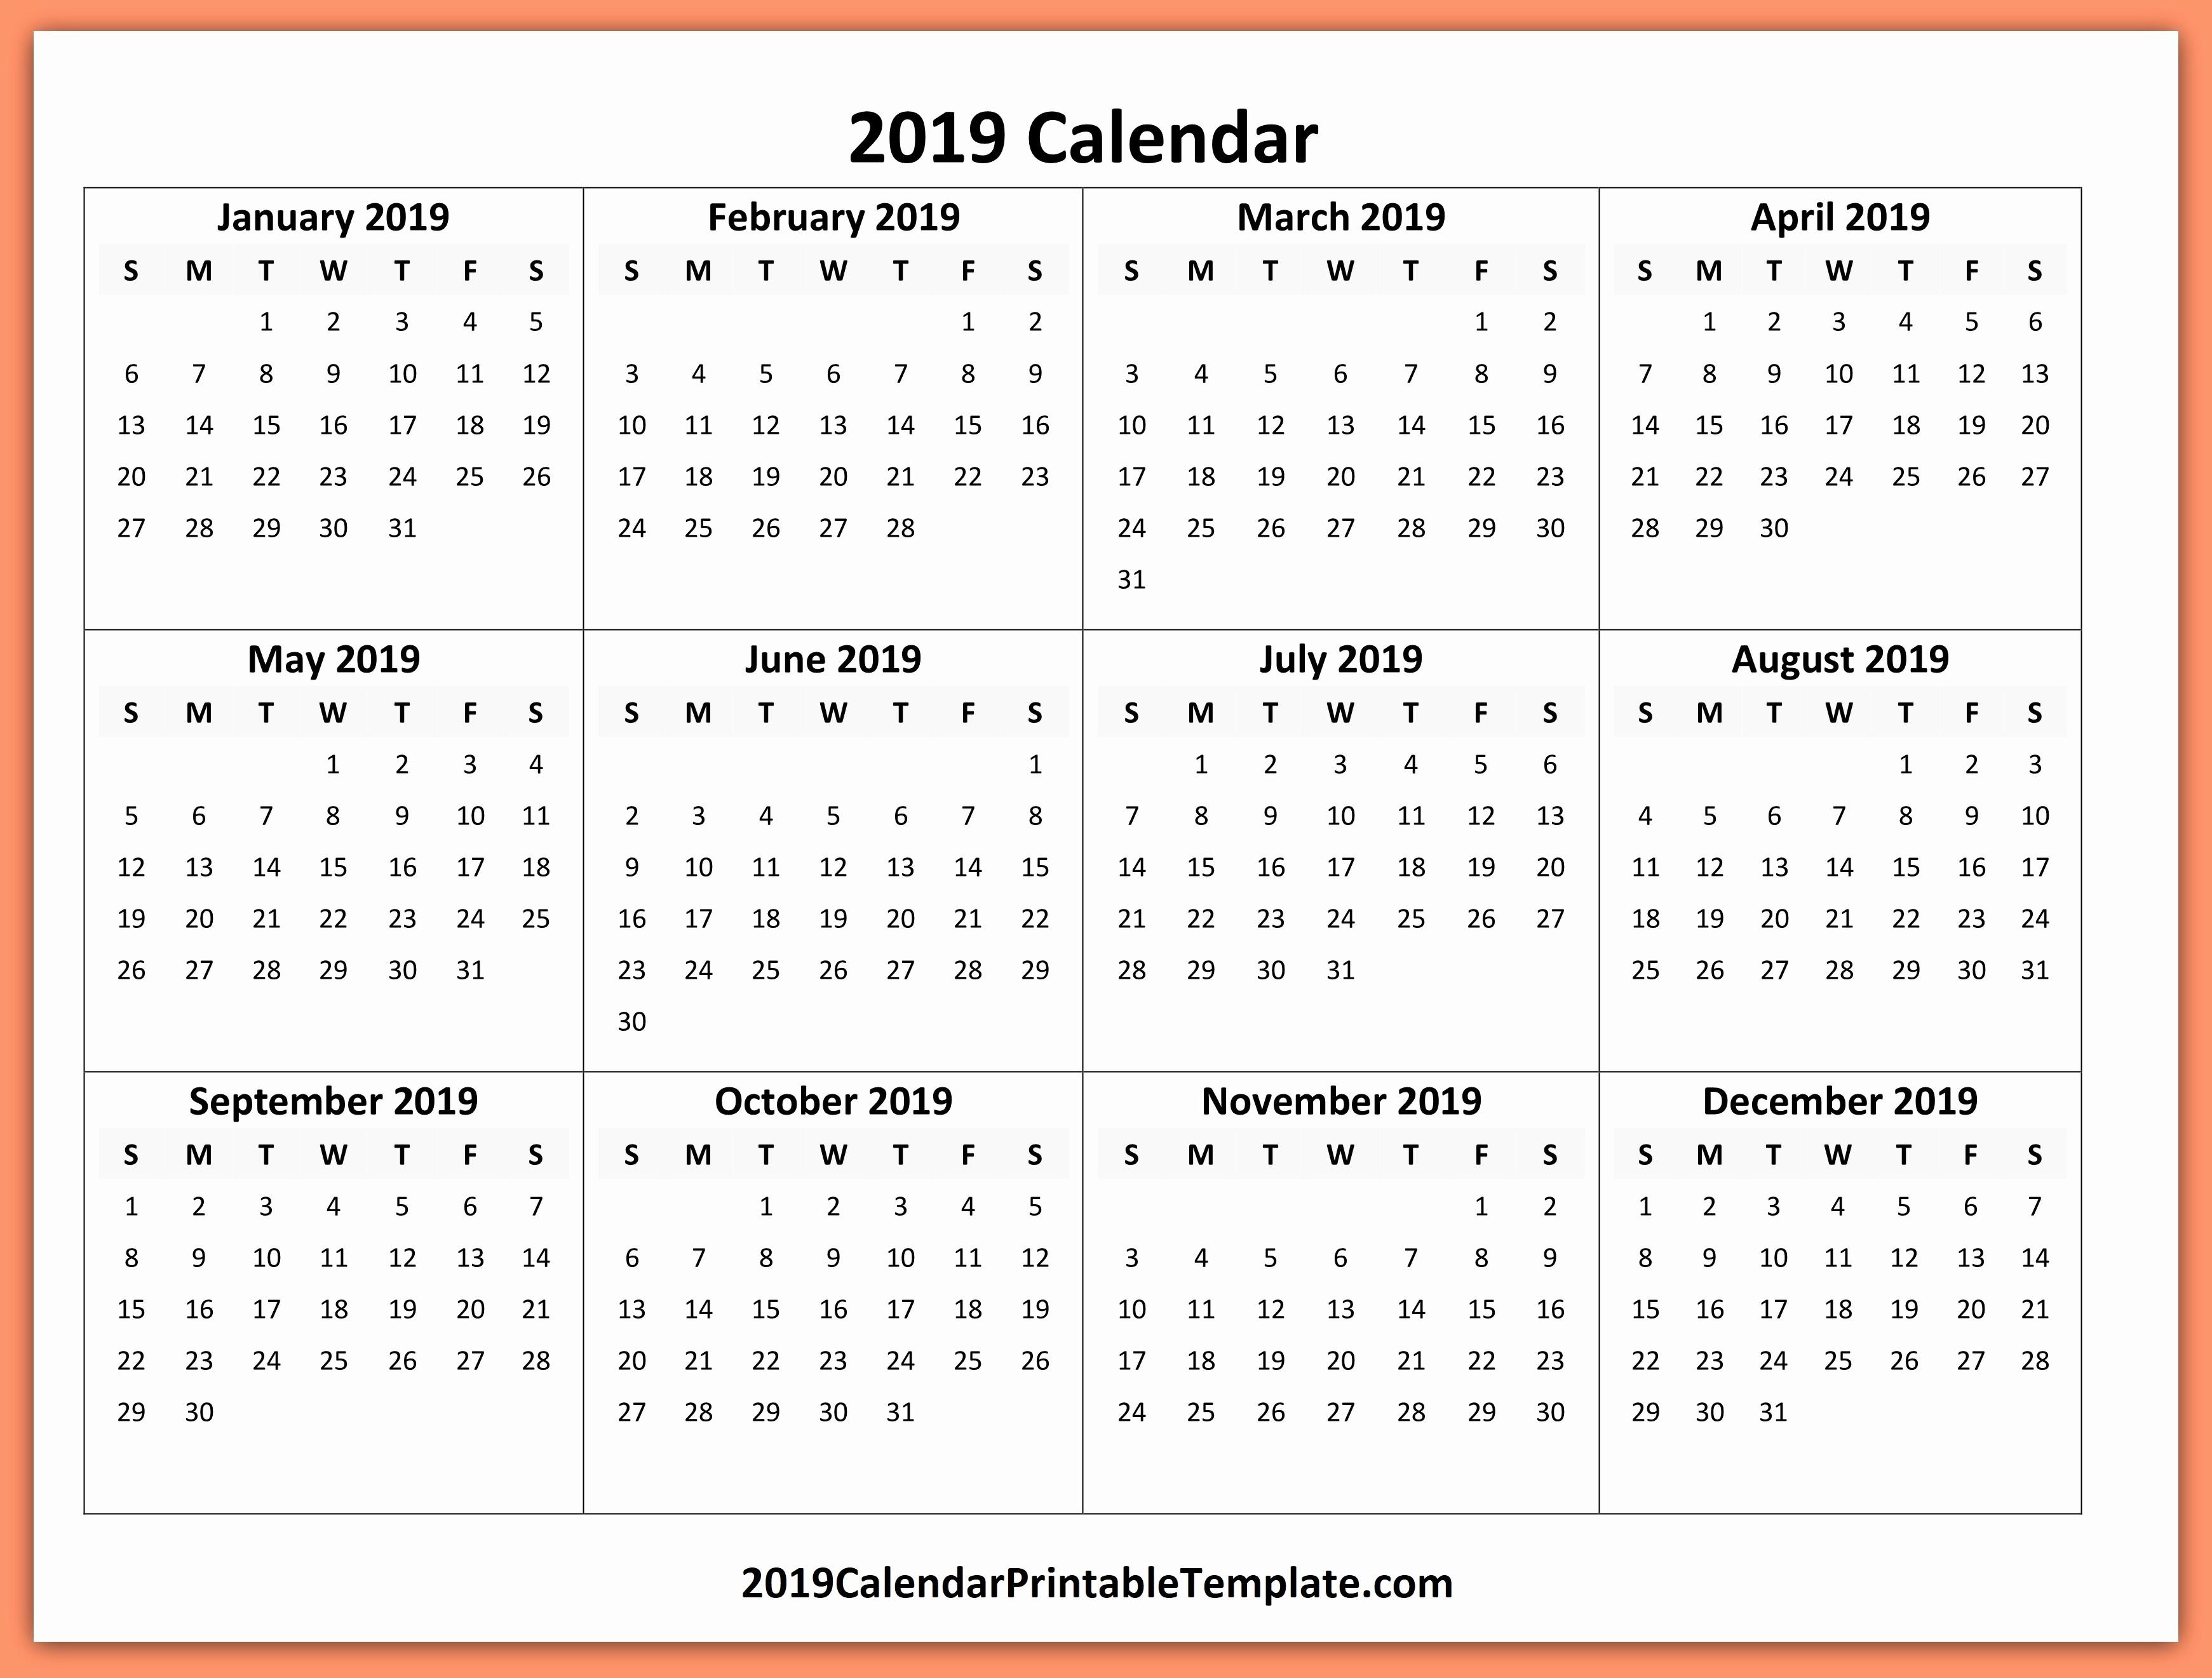 2019 Word Calendar with Holidays Lovely 2019 Yearly Calendar Template 2019 Calendar Printable